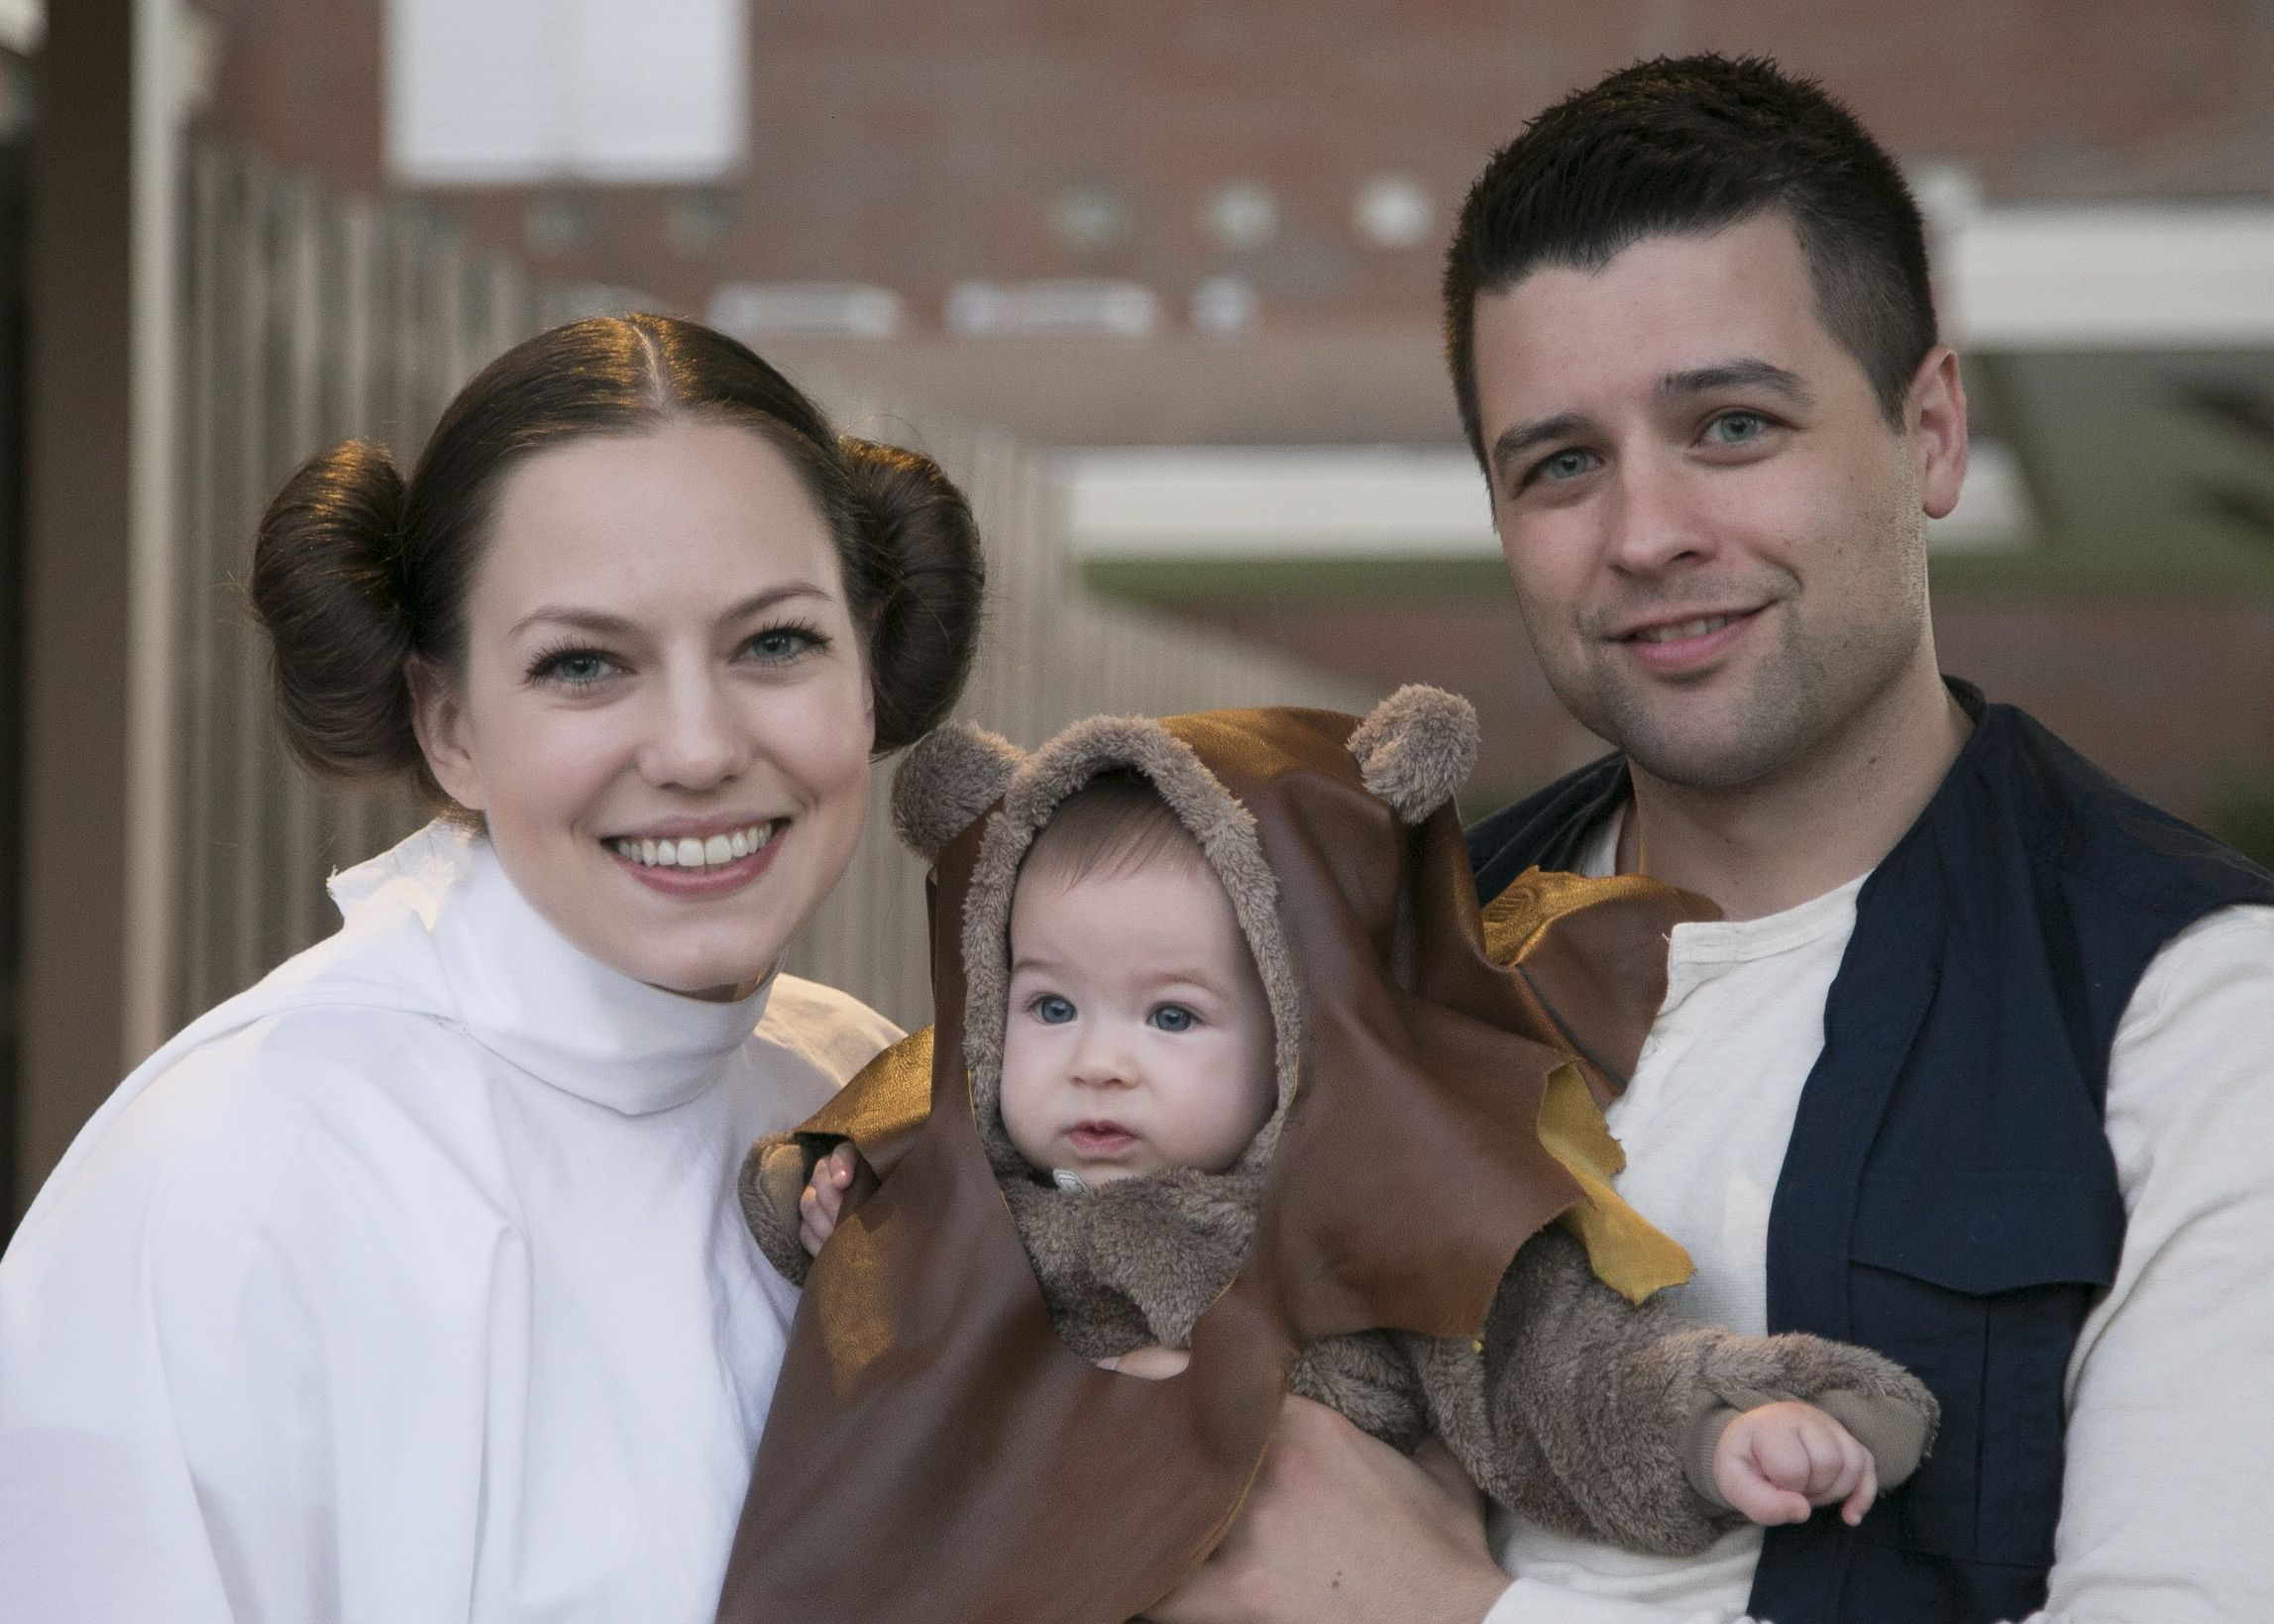 DIY Star Wars Family Halloween Costumes  sc 1 st  Pinterest & DIY Star Wars Family Halloween Costumes | Halloween Ideas ...